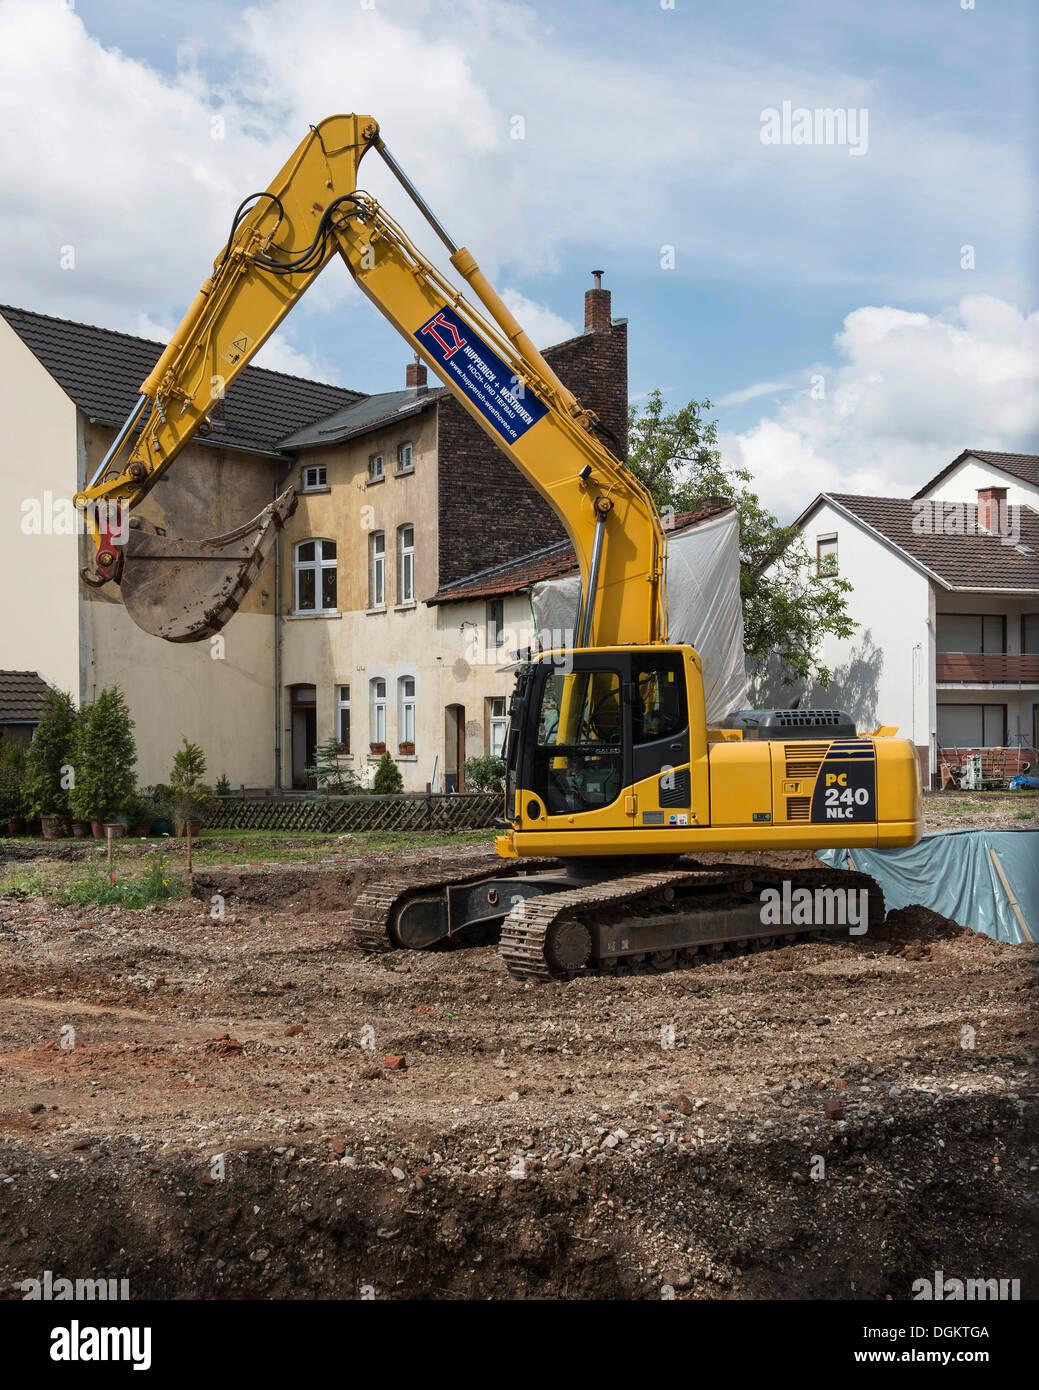 Construction, backhoe excavating land in Bonn, North Rhine-Westphalia, PublicGround - Stock Image